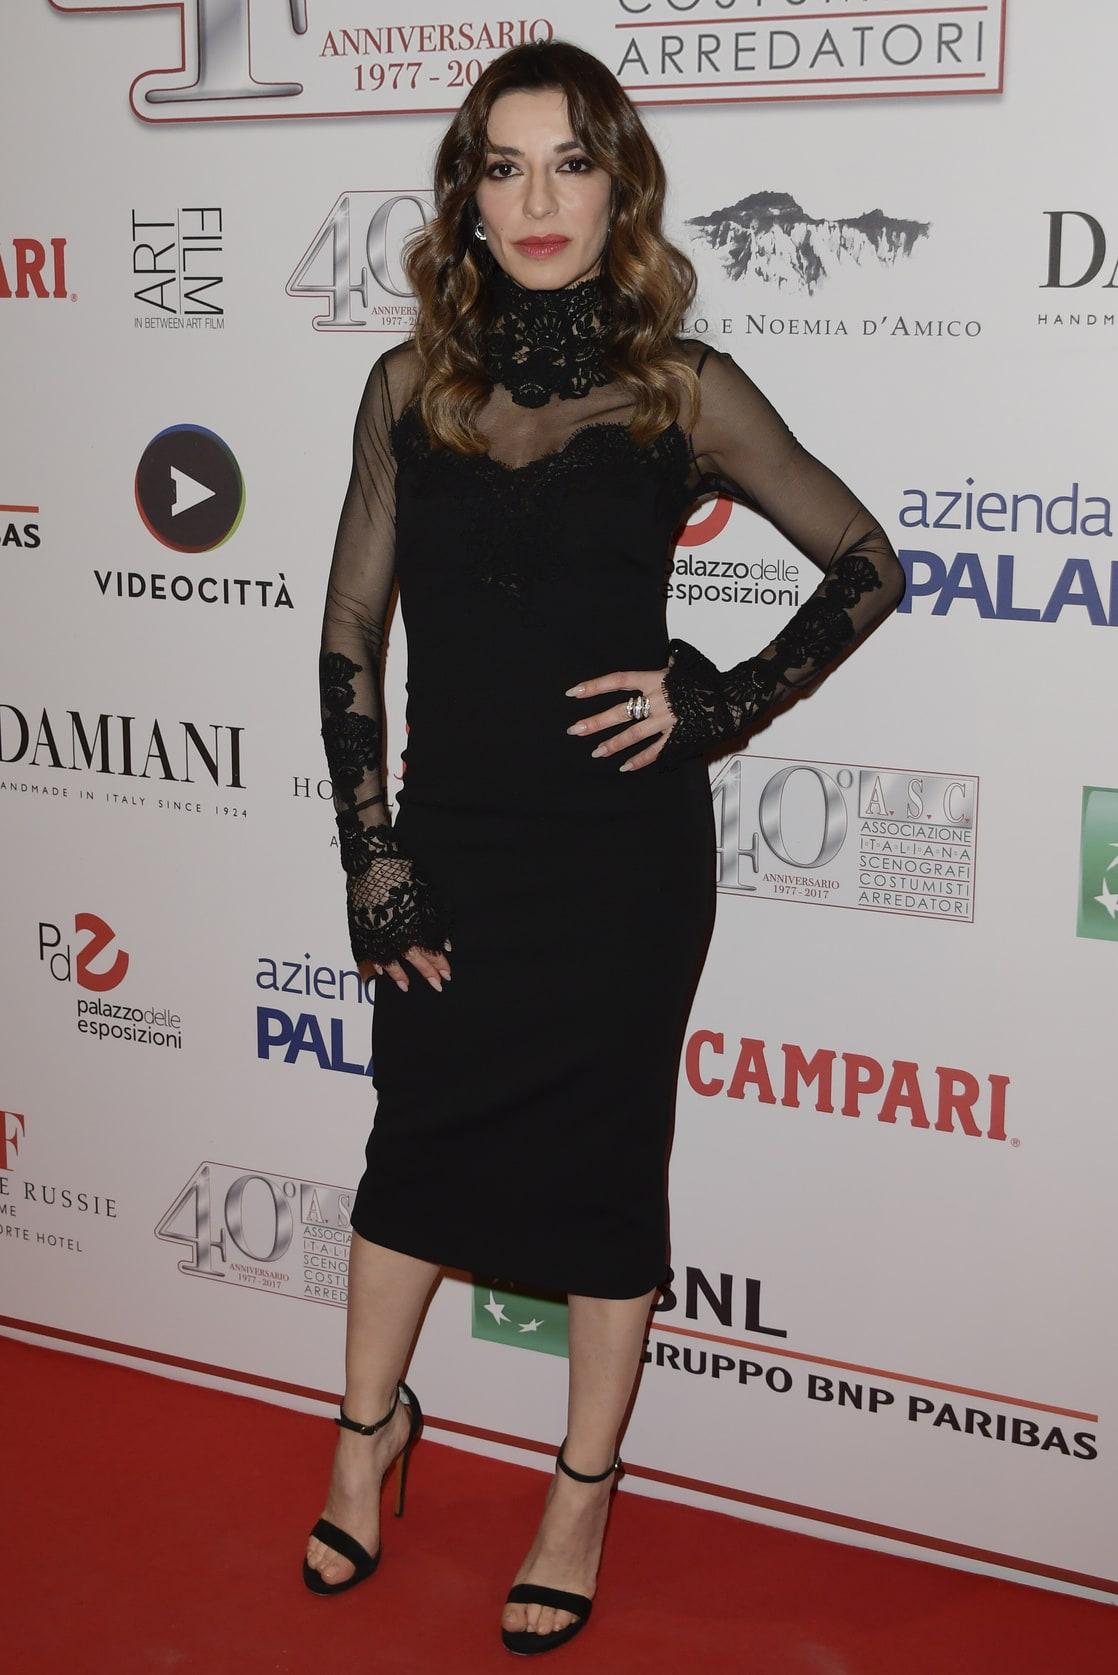 Sabrina Impacciatore naked (78 fotos) Bikini, 2018, cameltoe